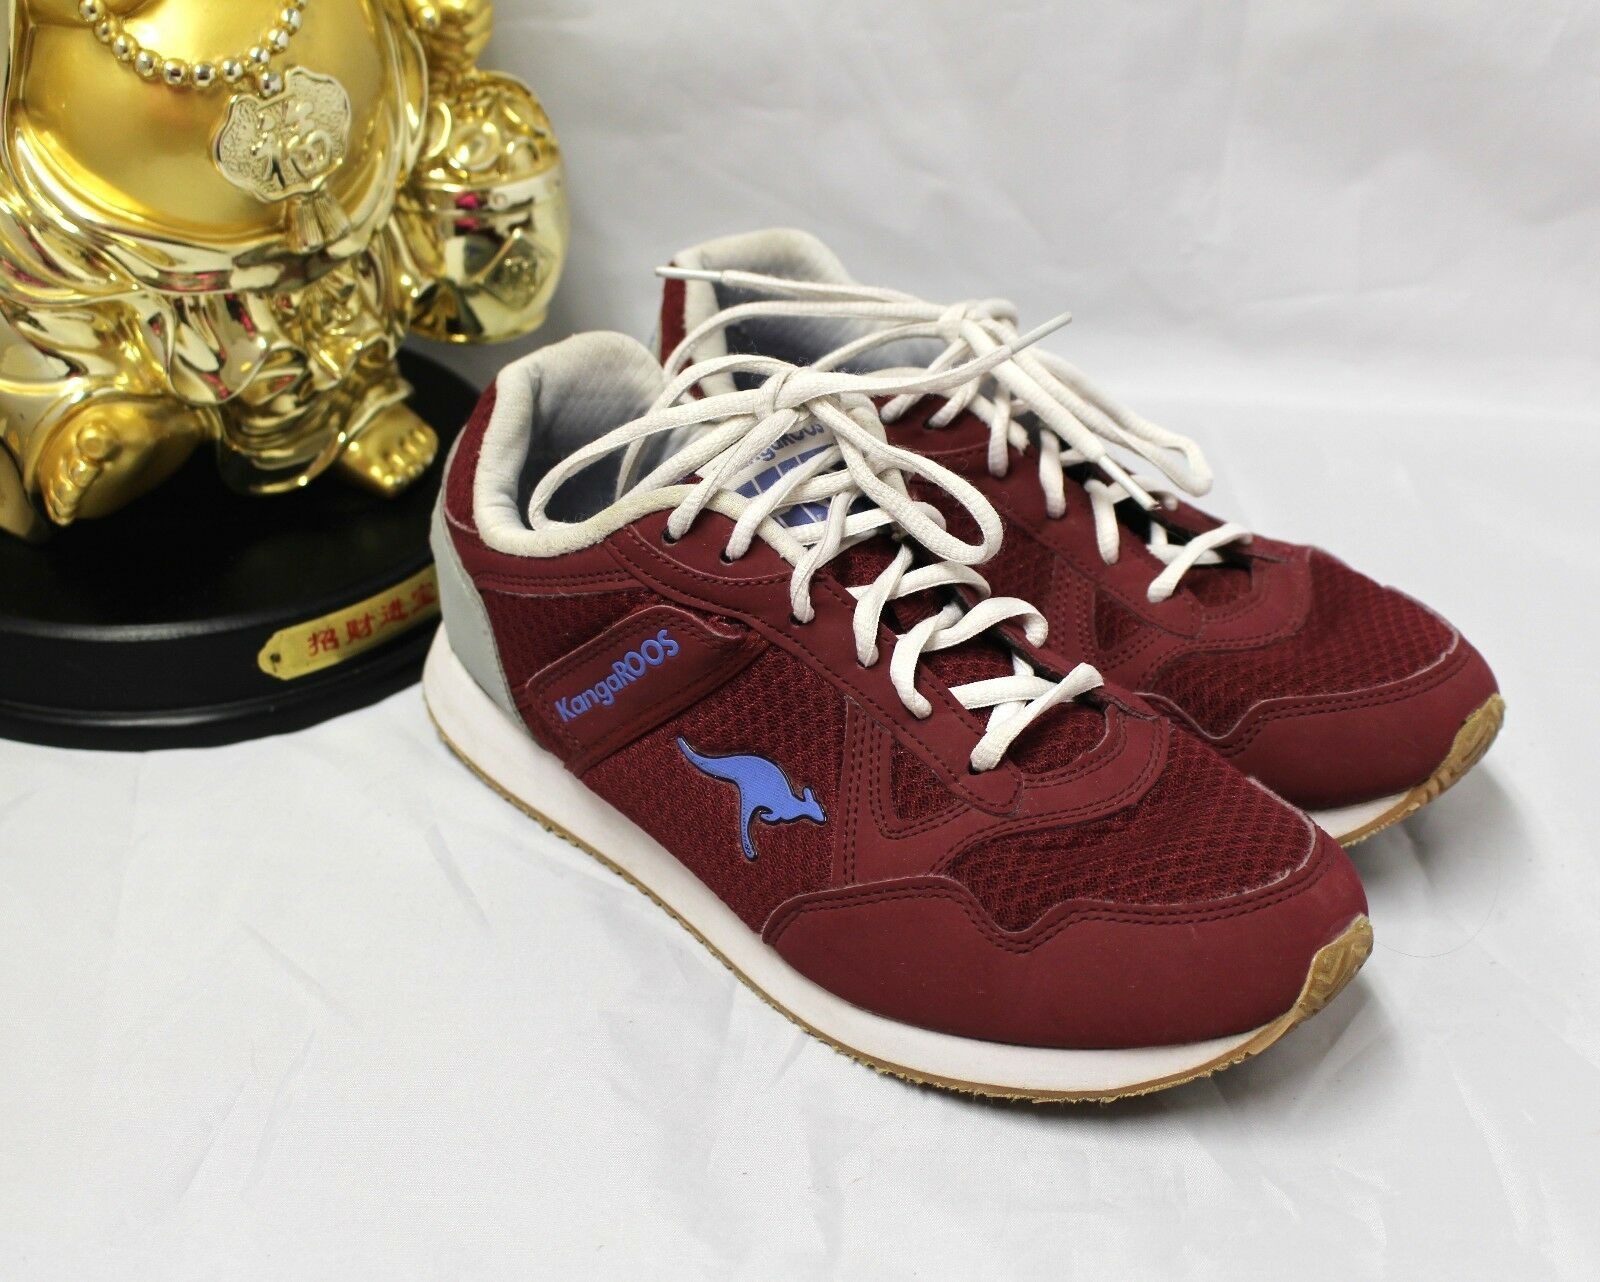 14a0b876cd ROOS Women 9 Sneakers Berry Side Packet Running Athletic Walking Kanga  Tennis nrftbl3080-Women's Athletic Shoes